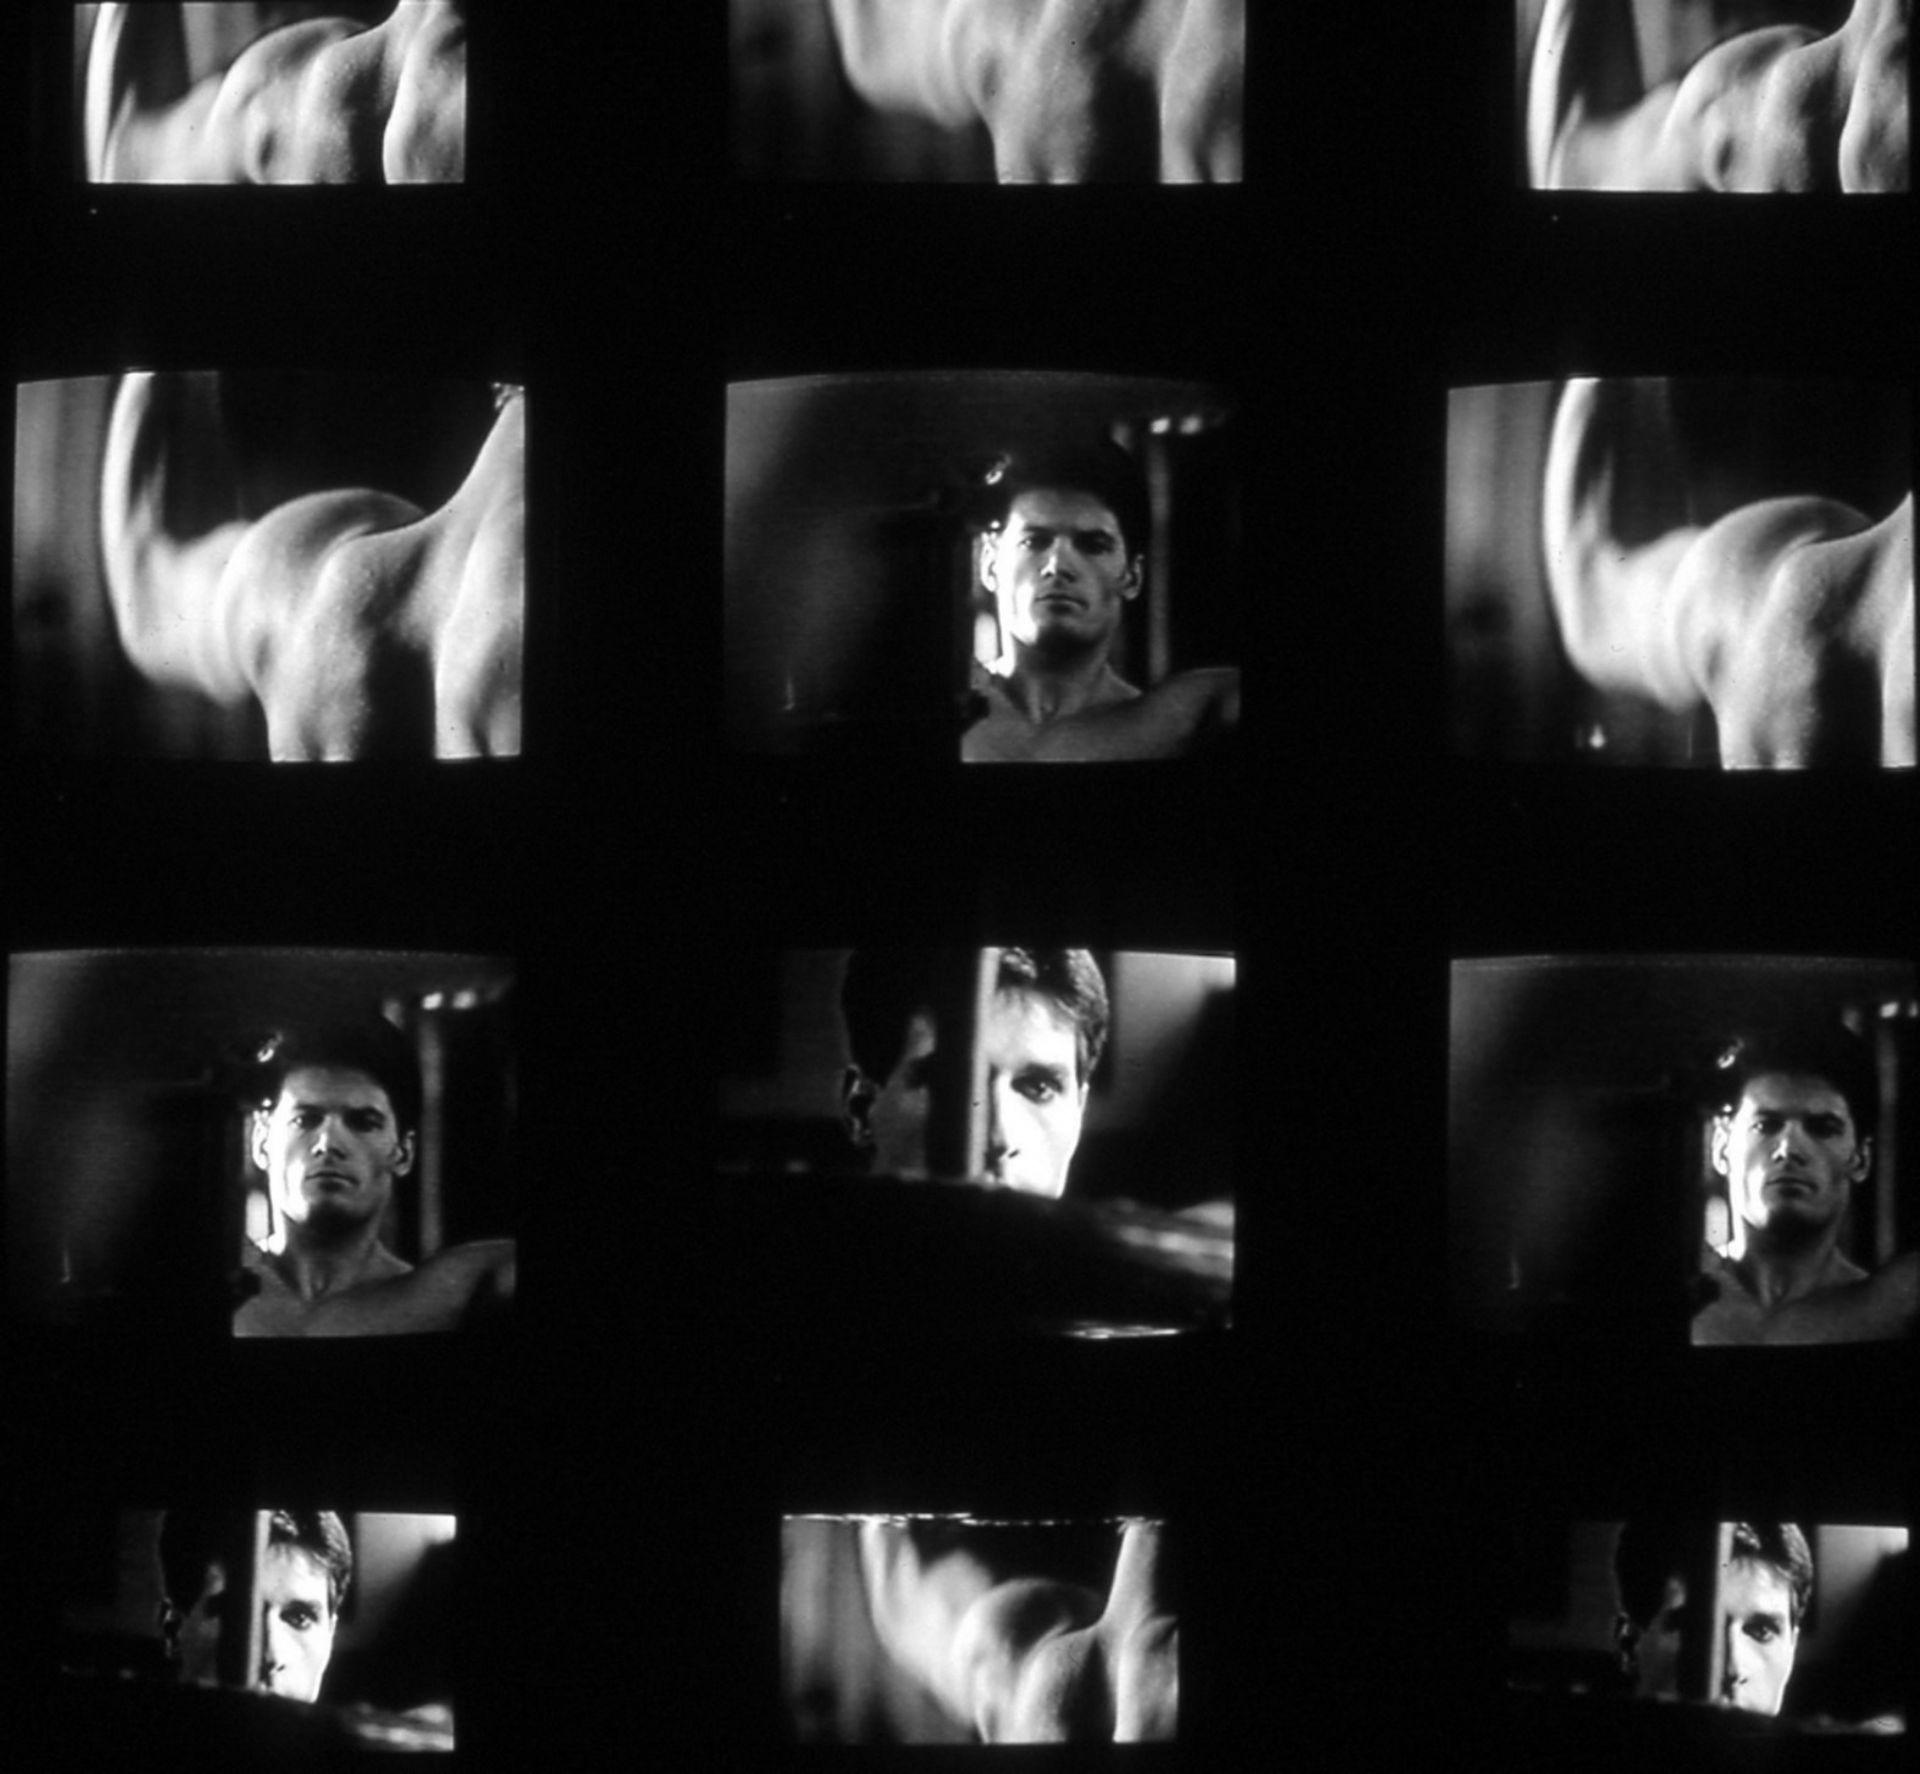 Le voyeur film 1994 - 4 2